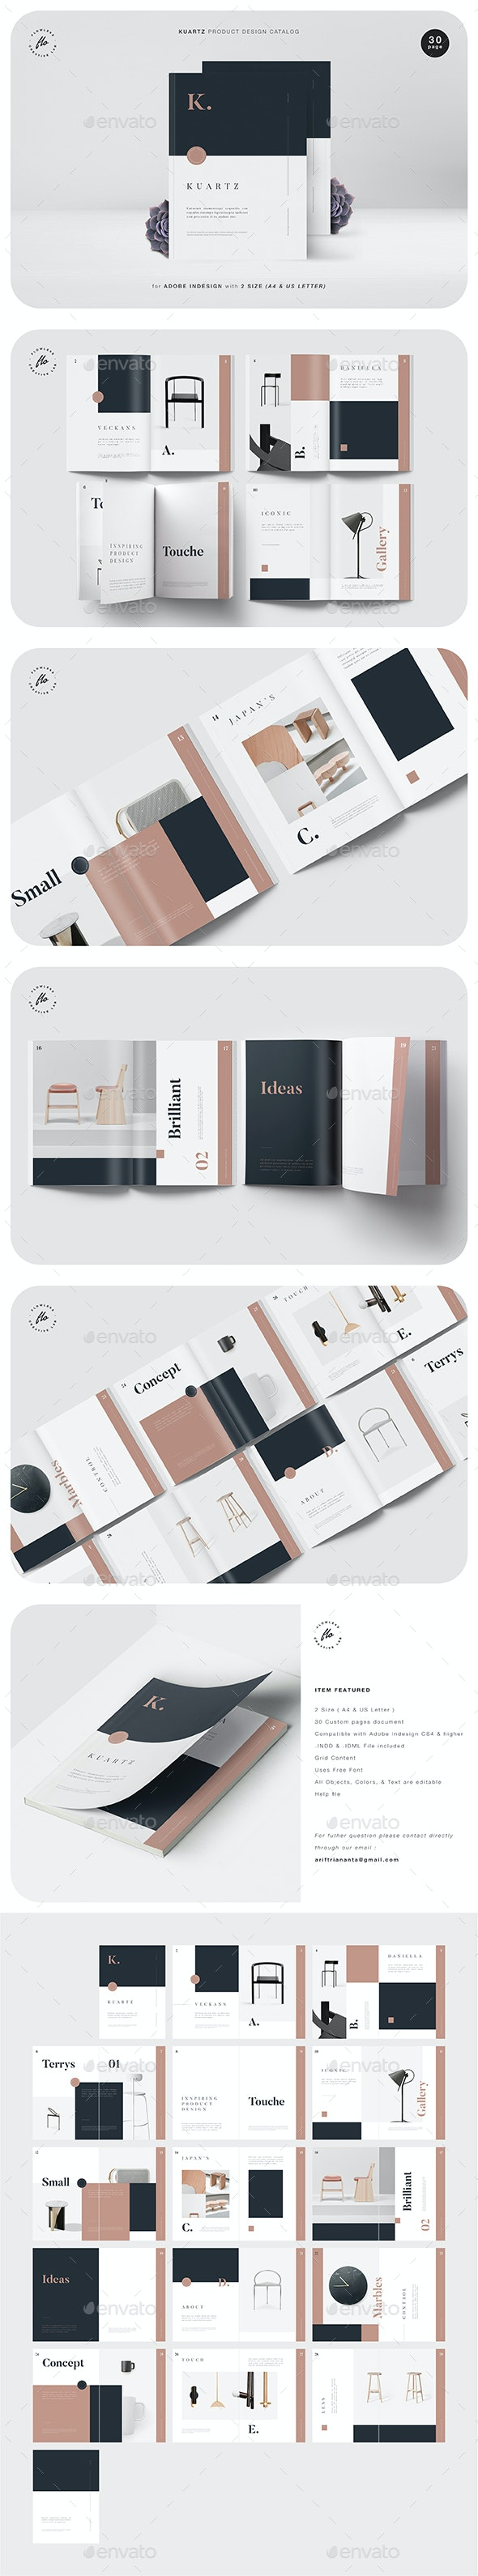 Kuartz Product Design Catalog - Magazines Print Templates